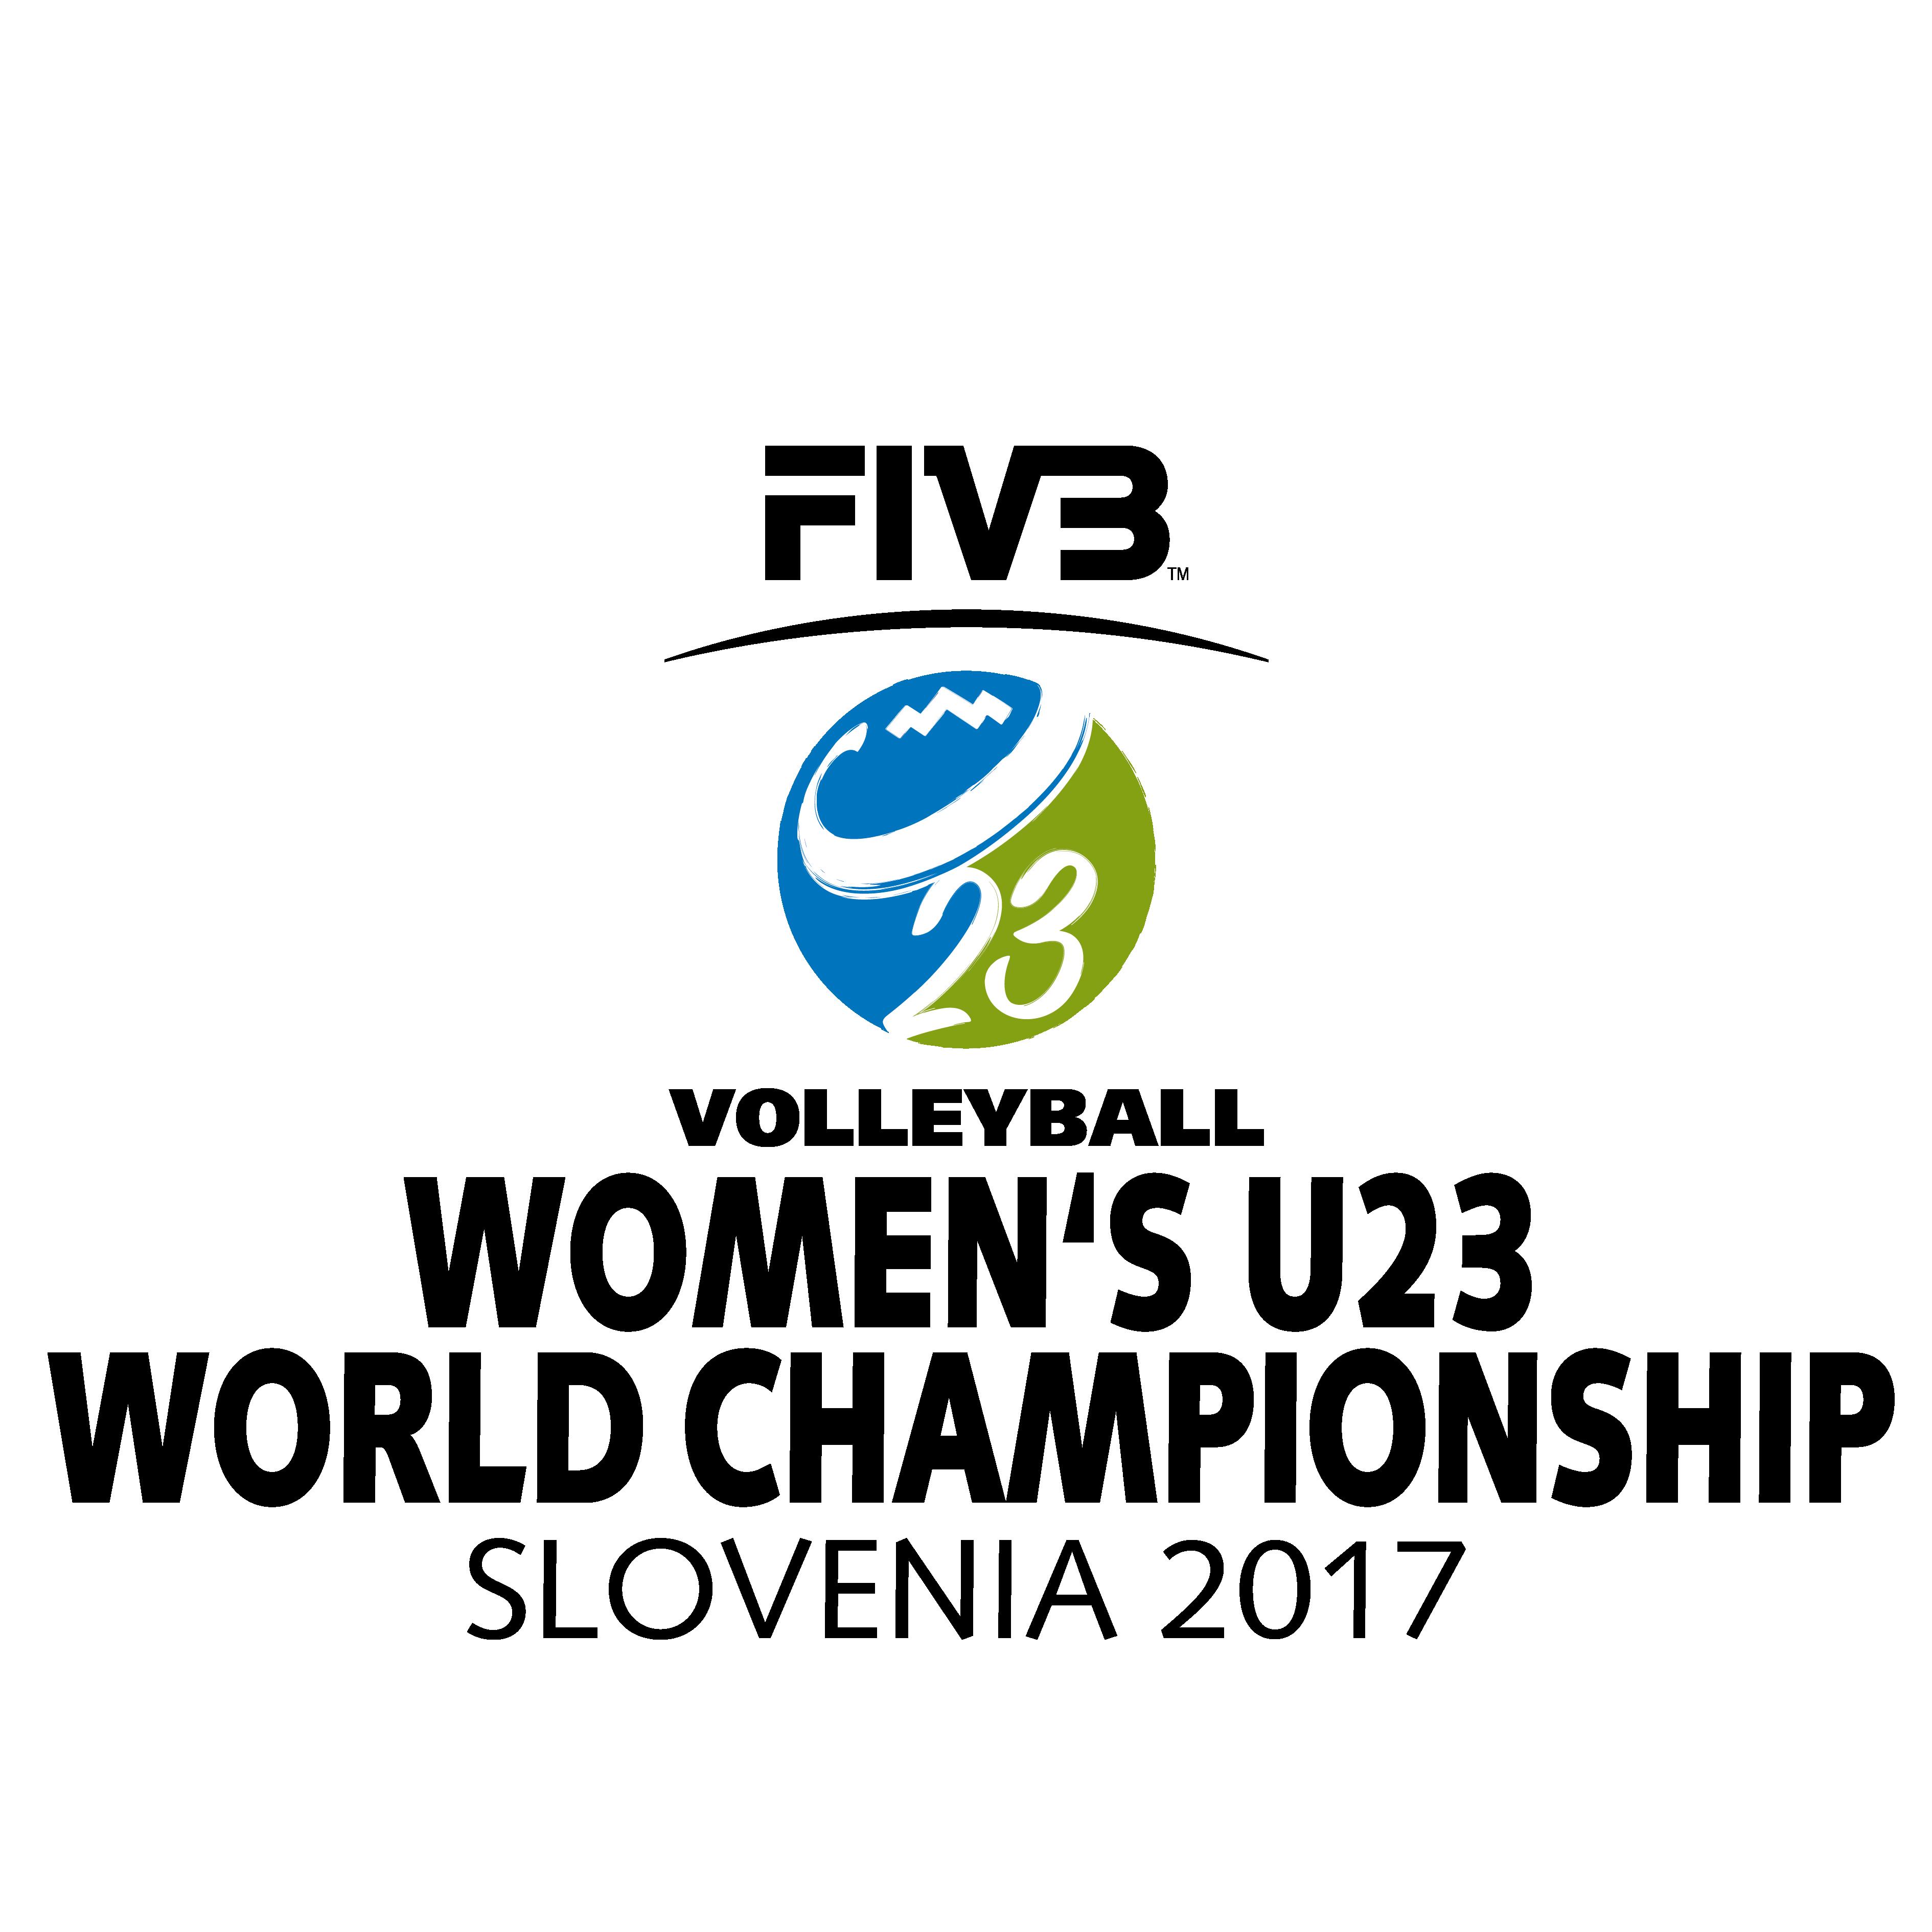 2017 FIVB Volleyball World U23 Women's Championship